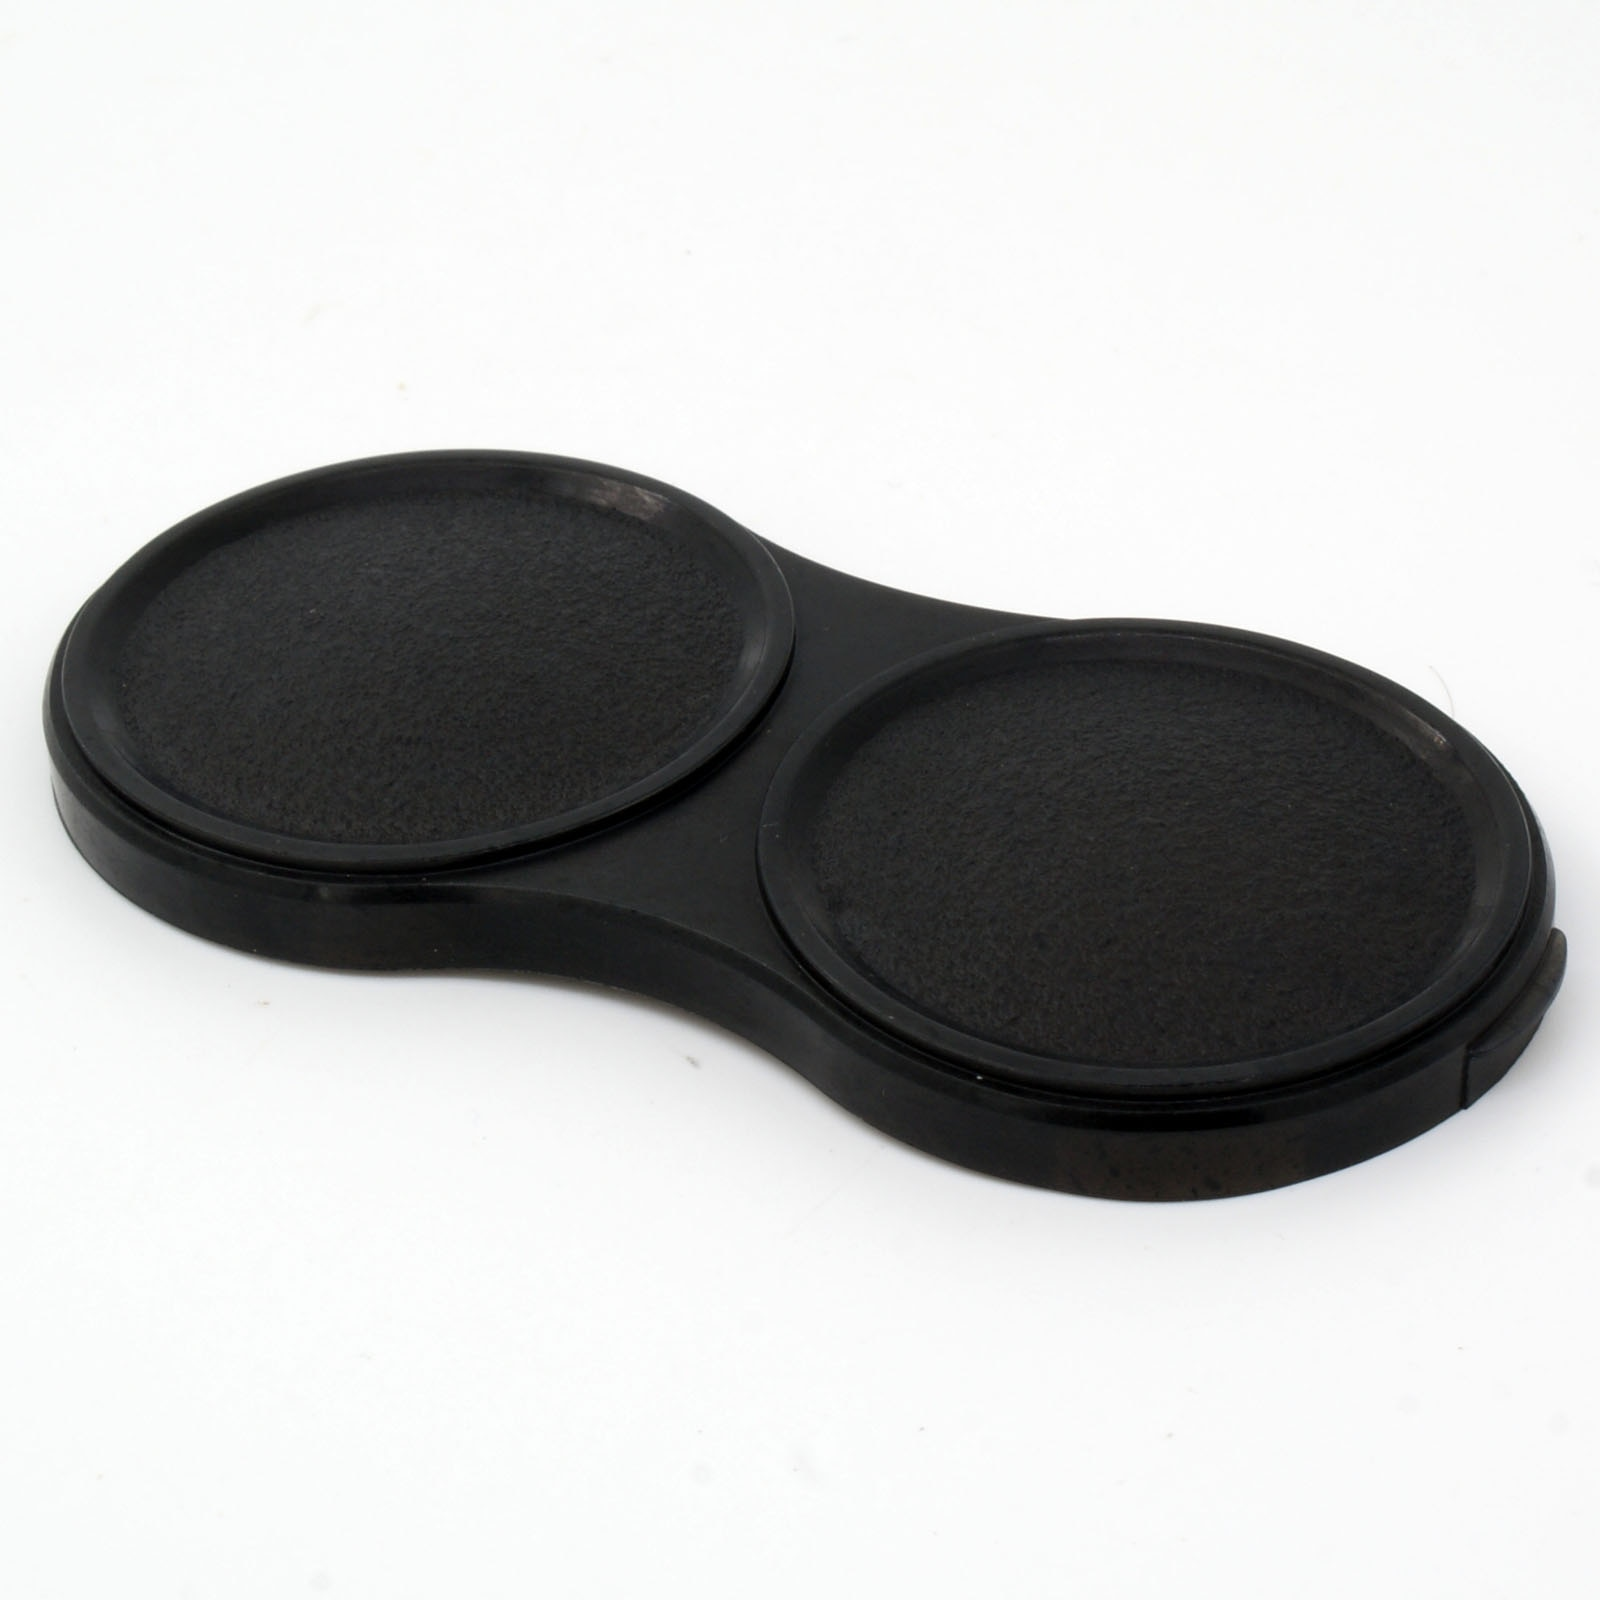 Tampões de lente duplos de plástico para autocord yashica 124 & 120 tlr câmera de formato médio